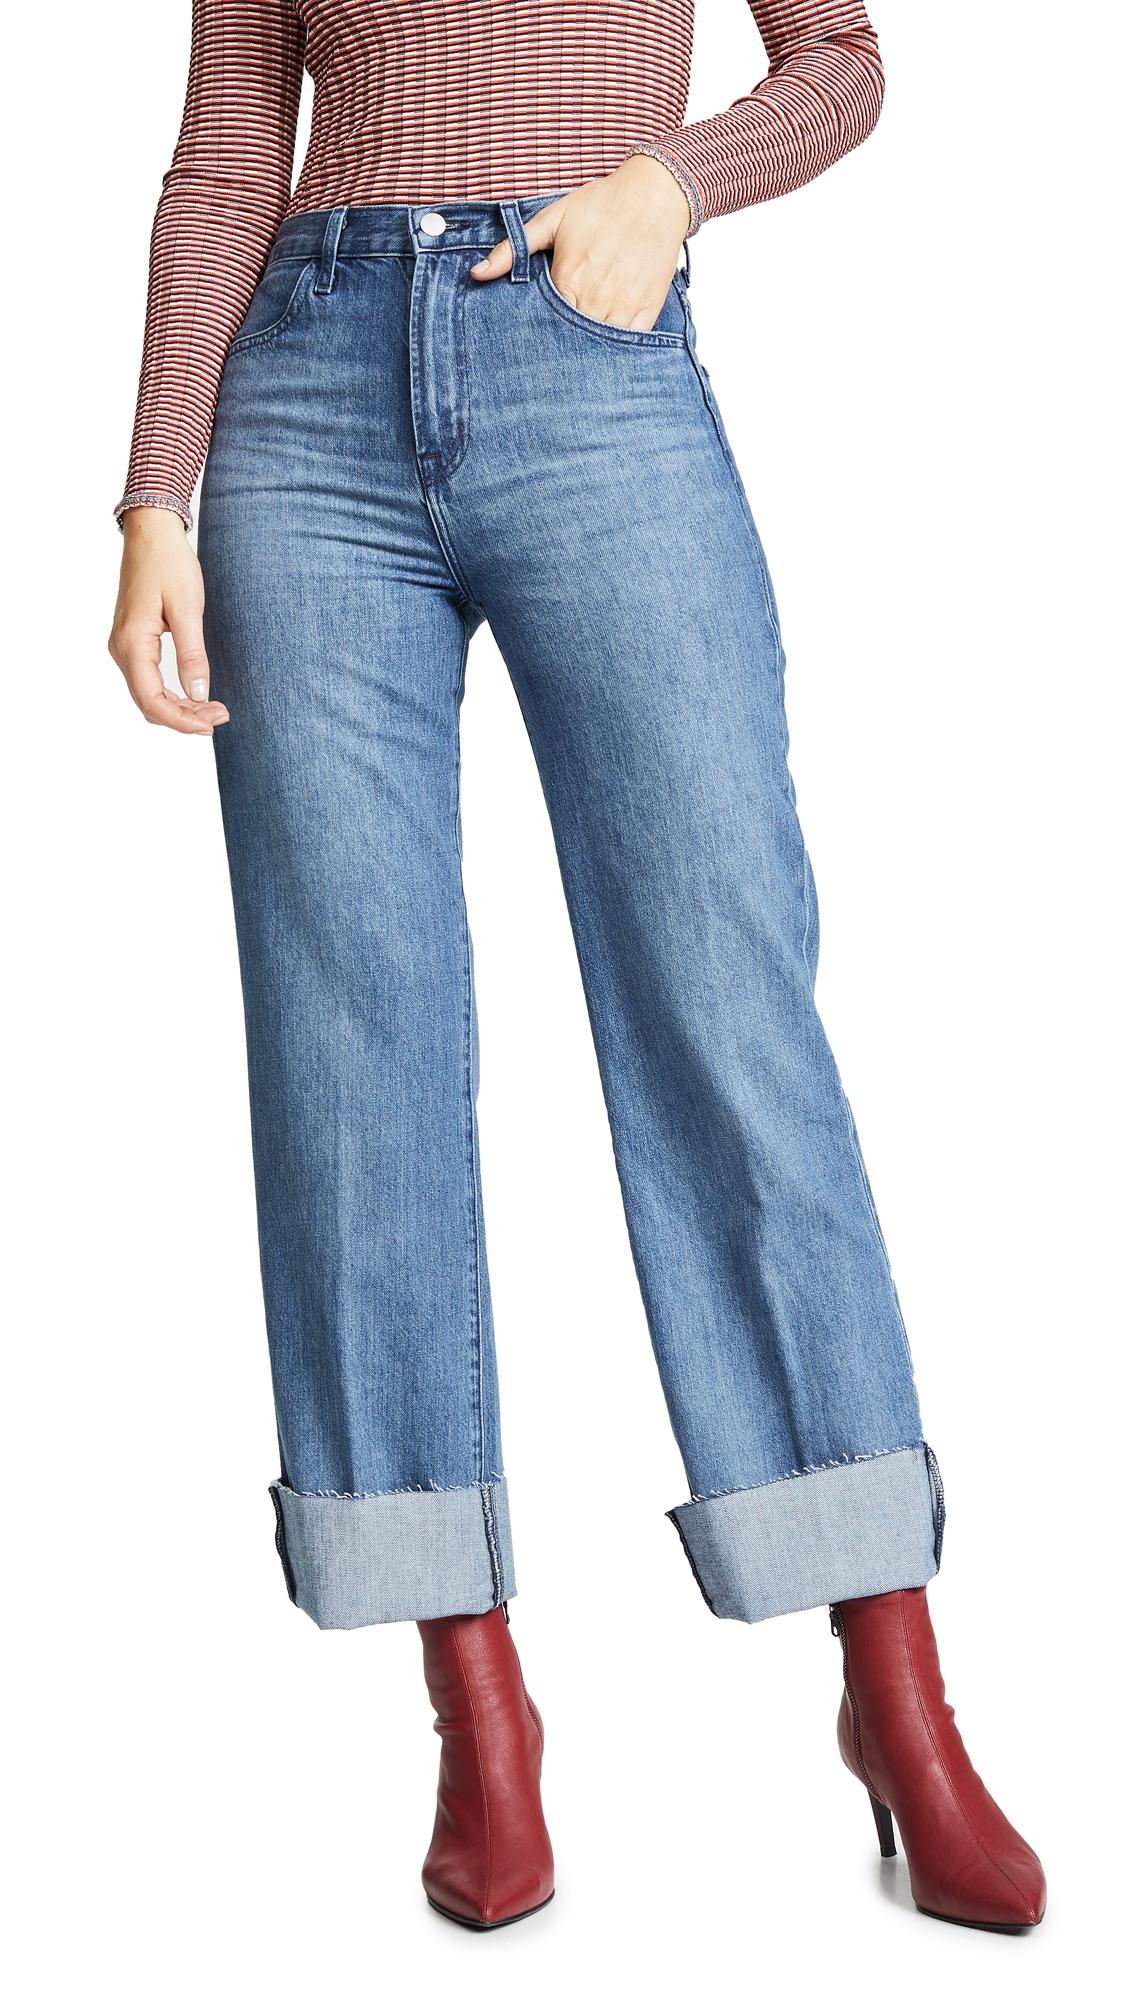 7bab99b30f5a J Brand Joan High Rise Crop Jeans - Electric Dream